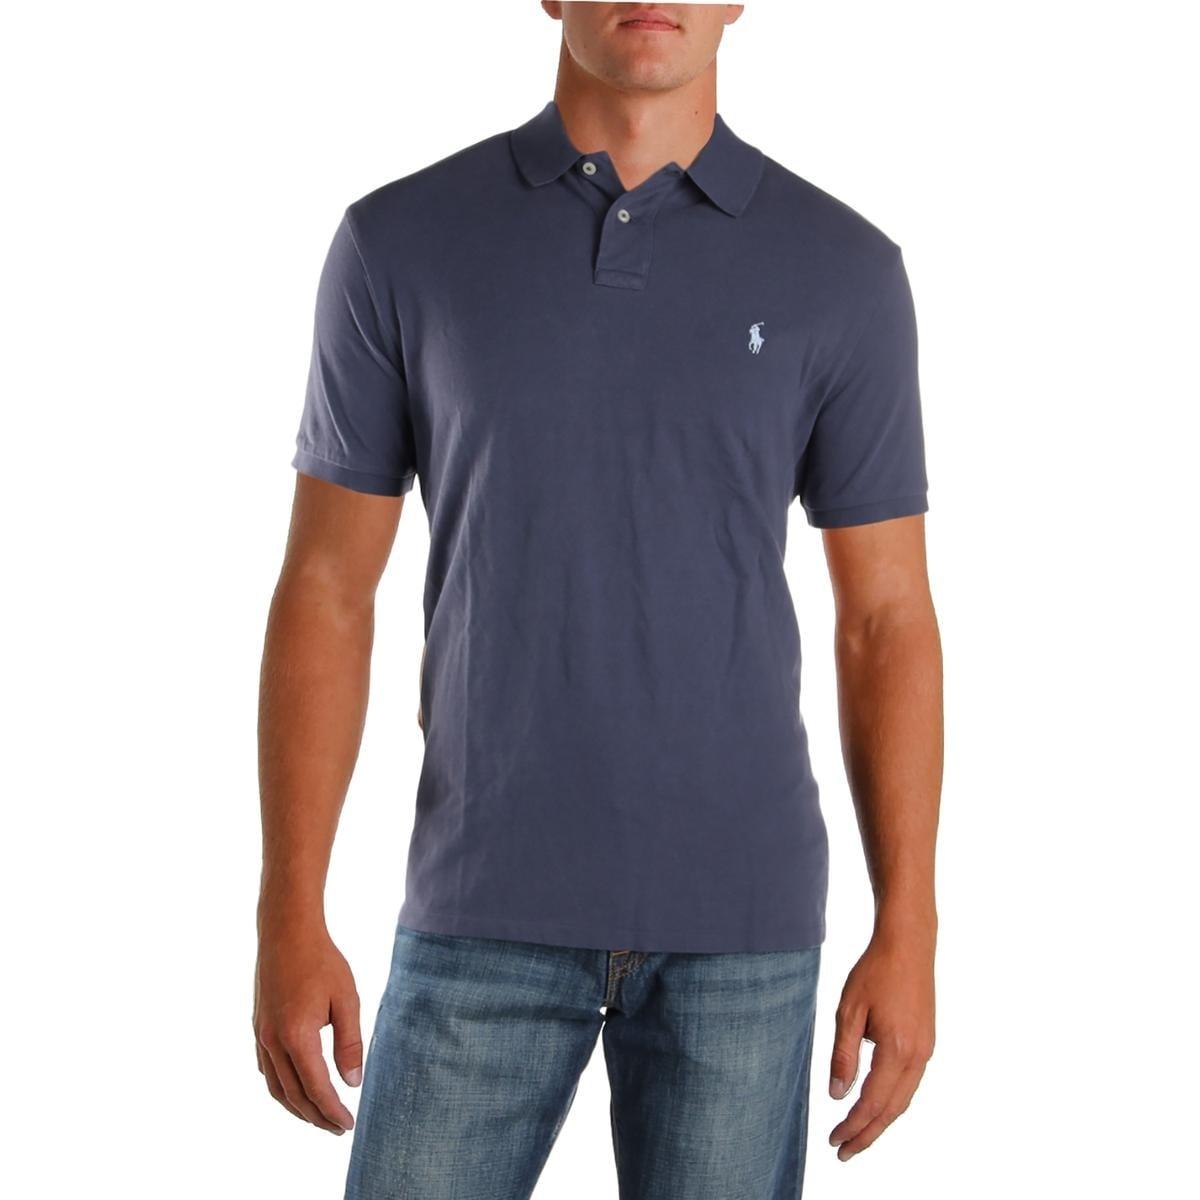 Shop Polo Ralph Lauren Mens Polo Shirt Textured Slim Fit Free